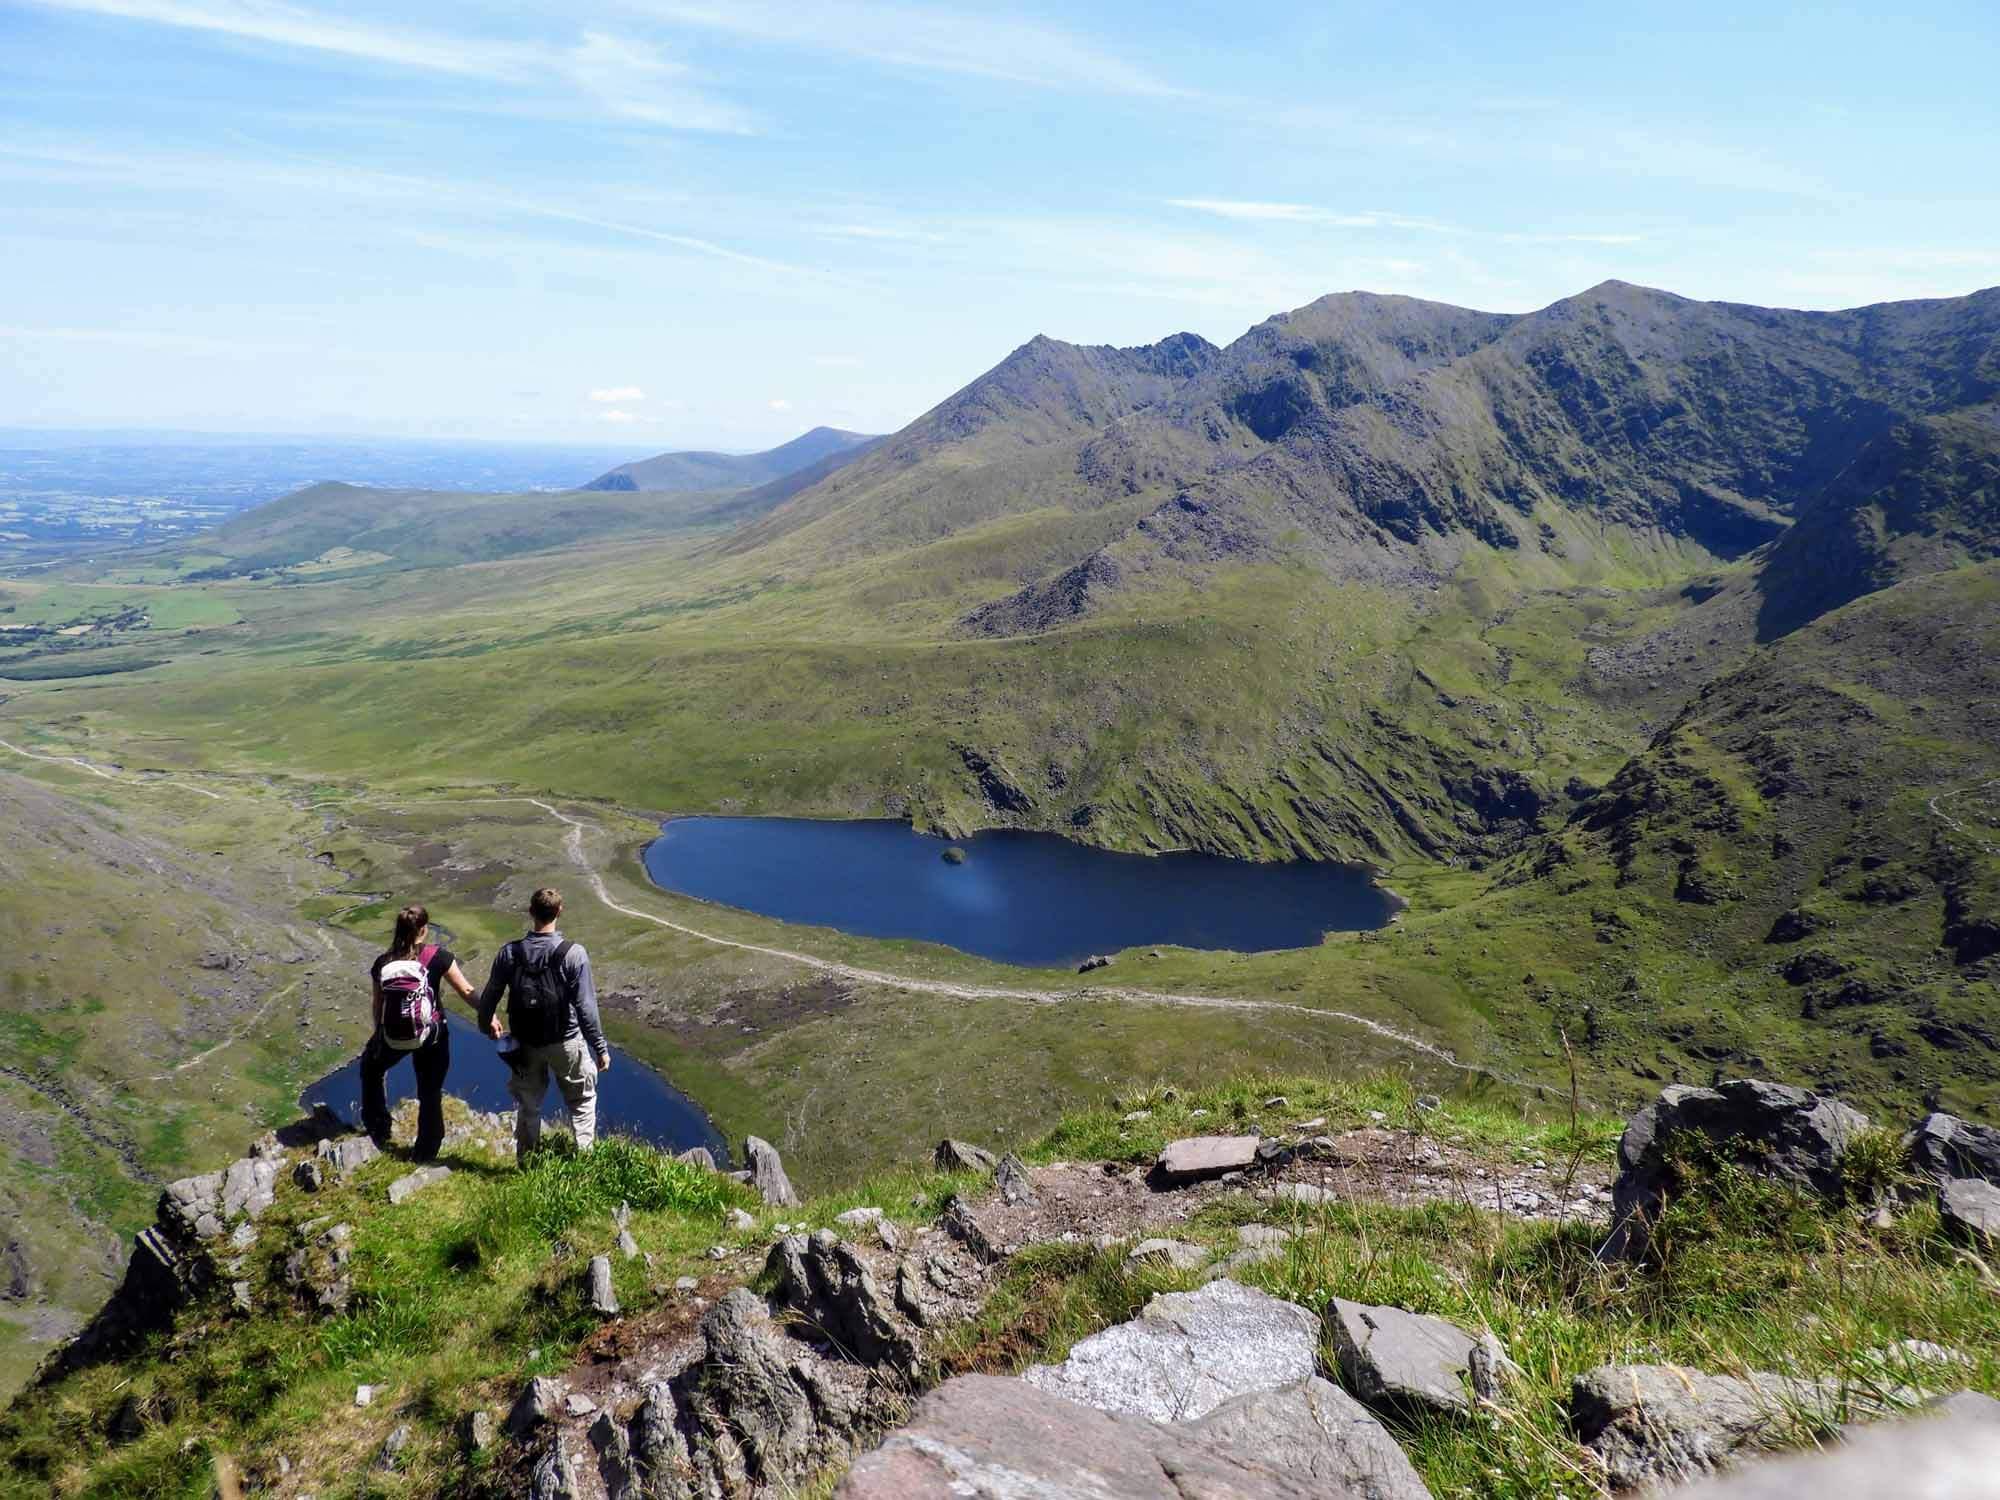 ireland-carrauntoohil-highest-mountain-peak-team-lake.jpg